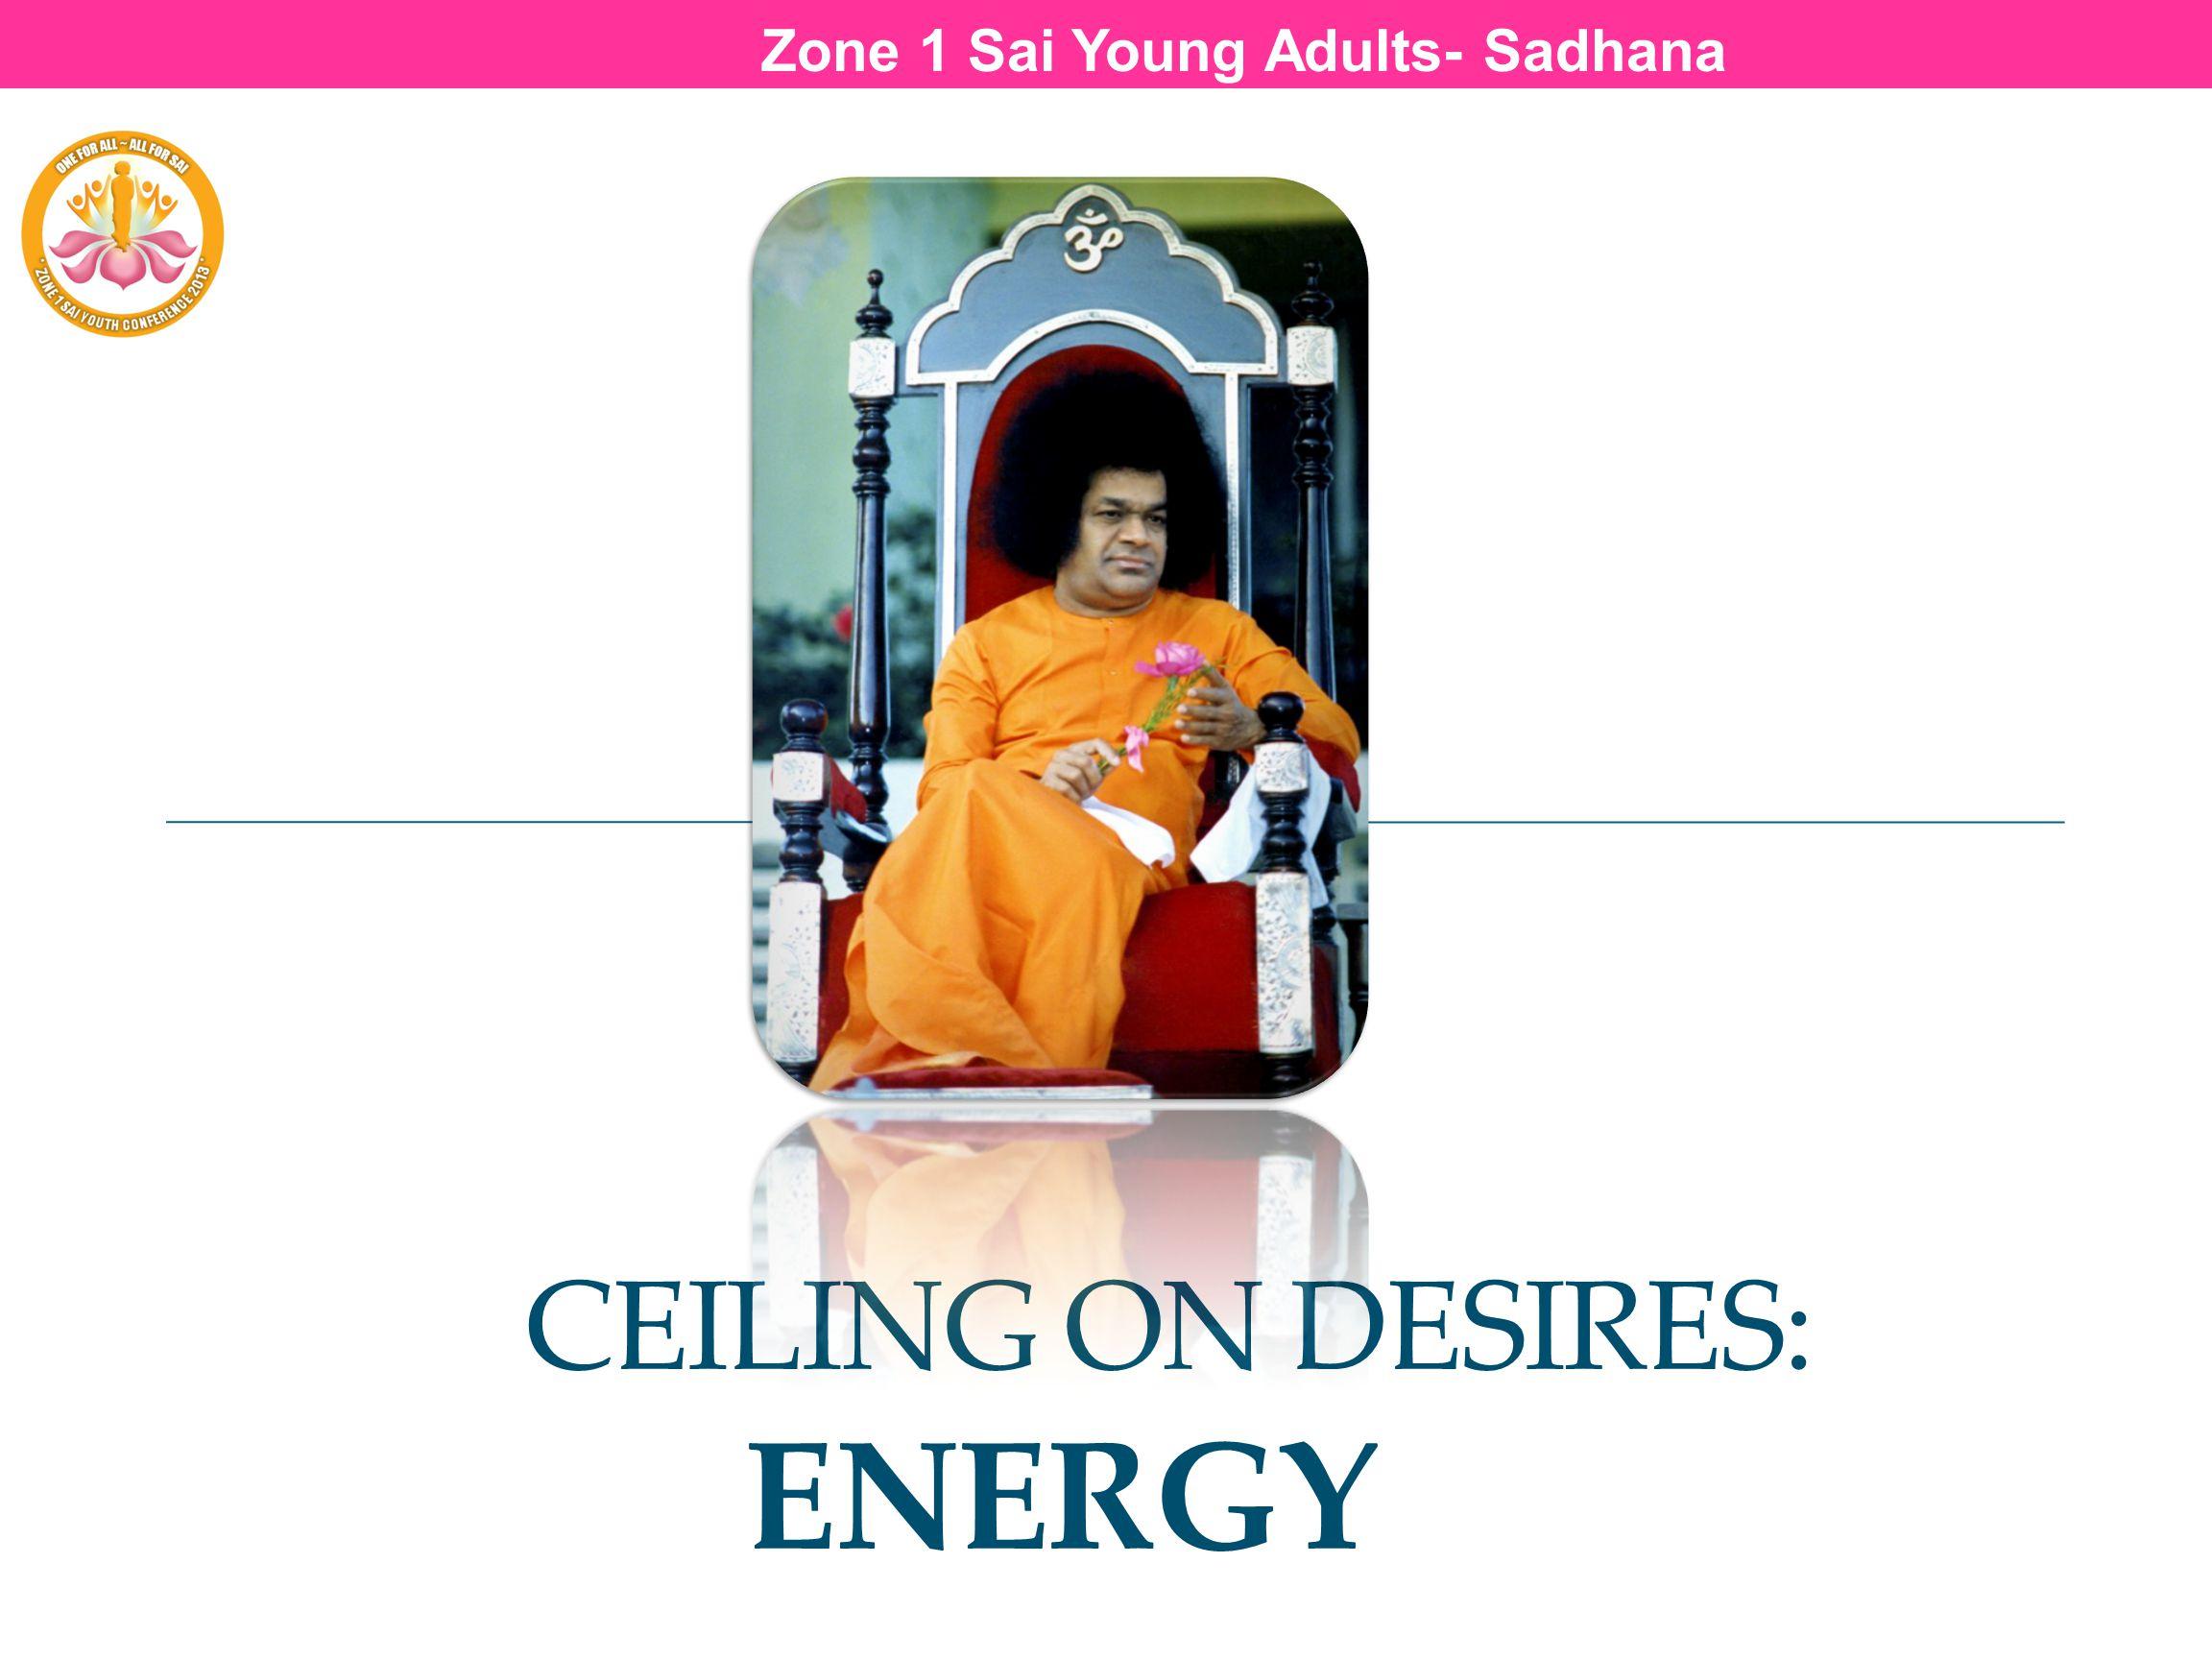 Ceiling on Desires: ENERGY